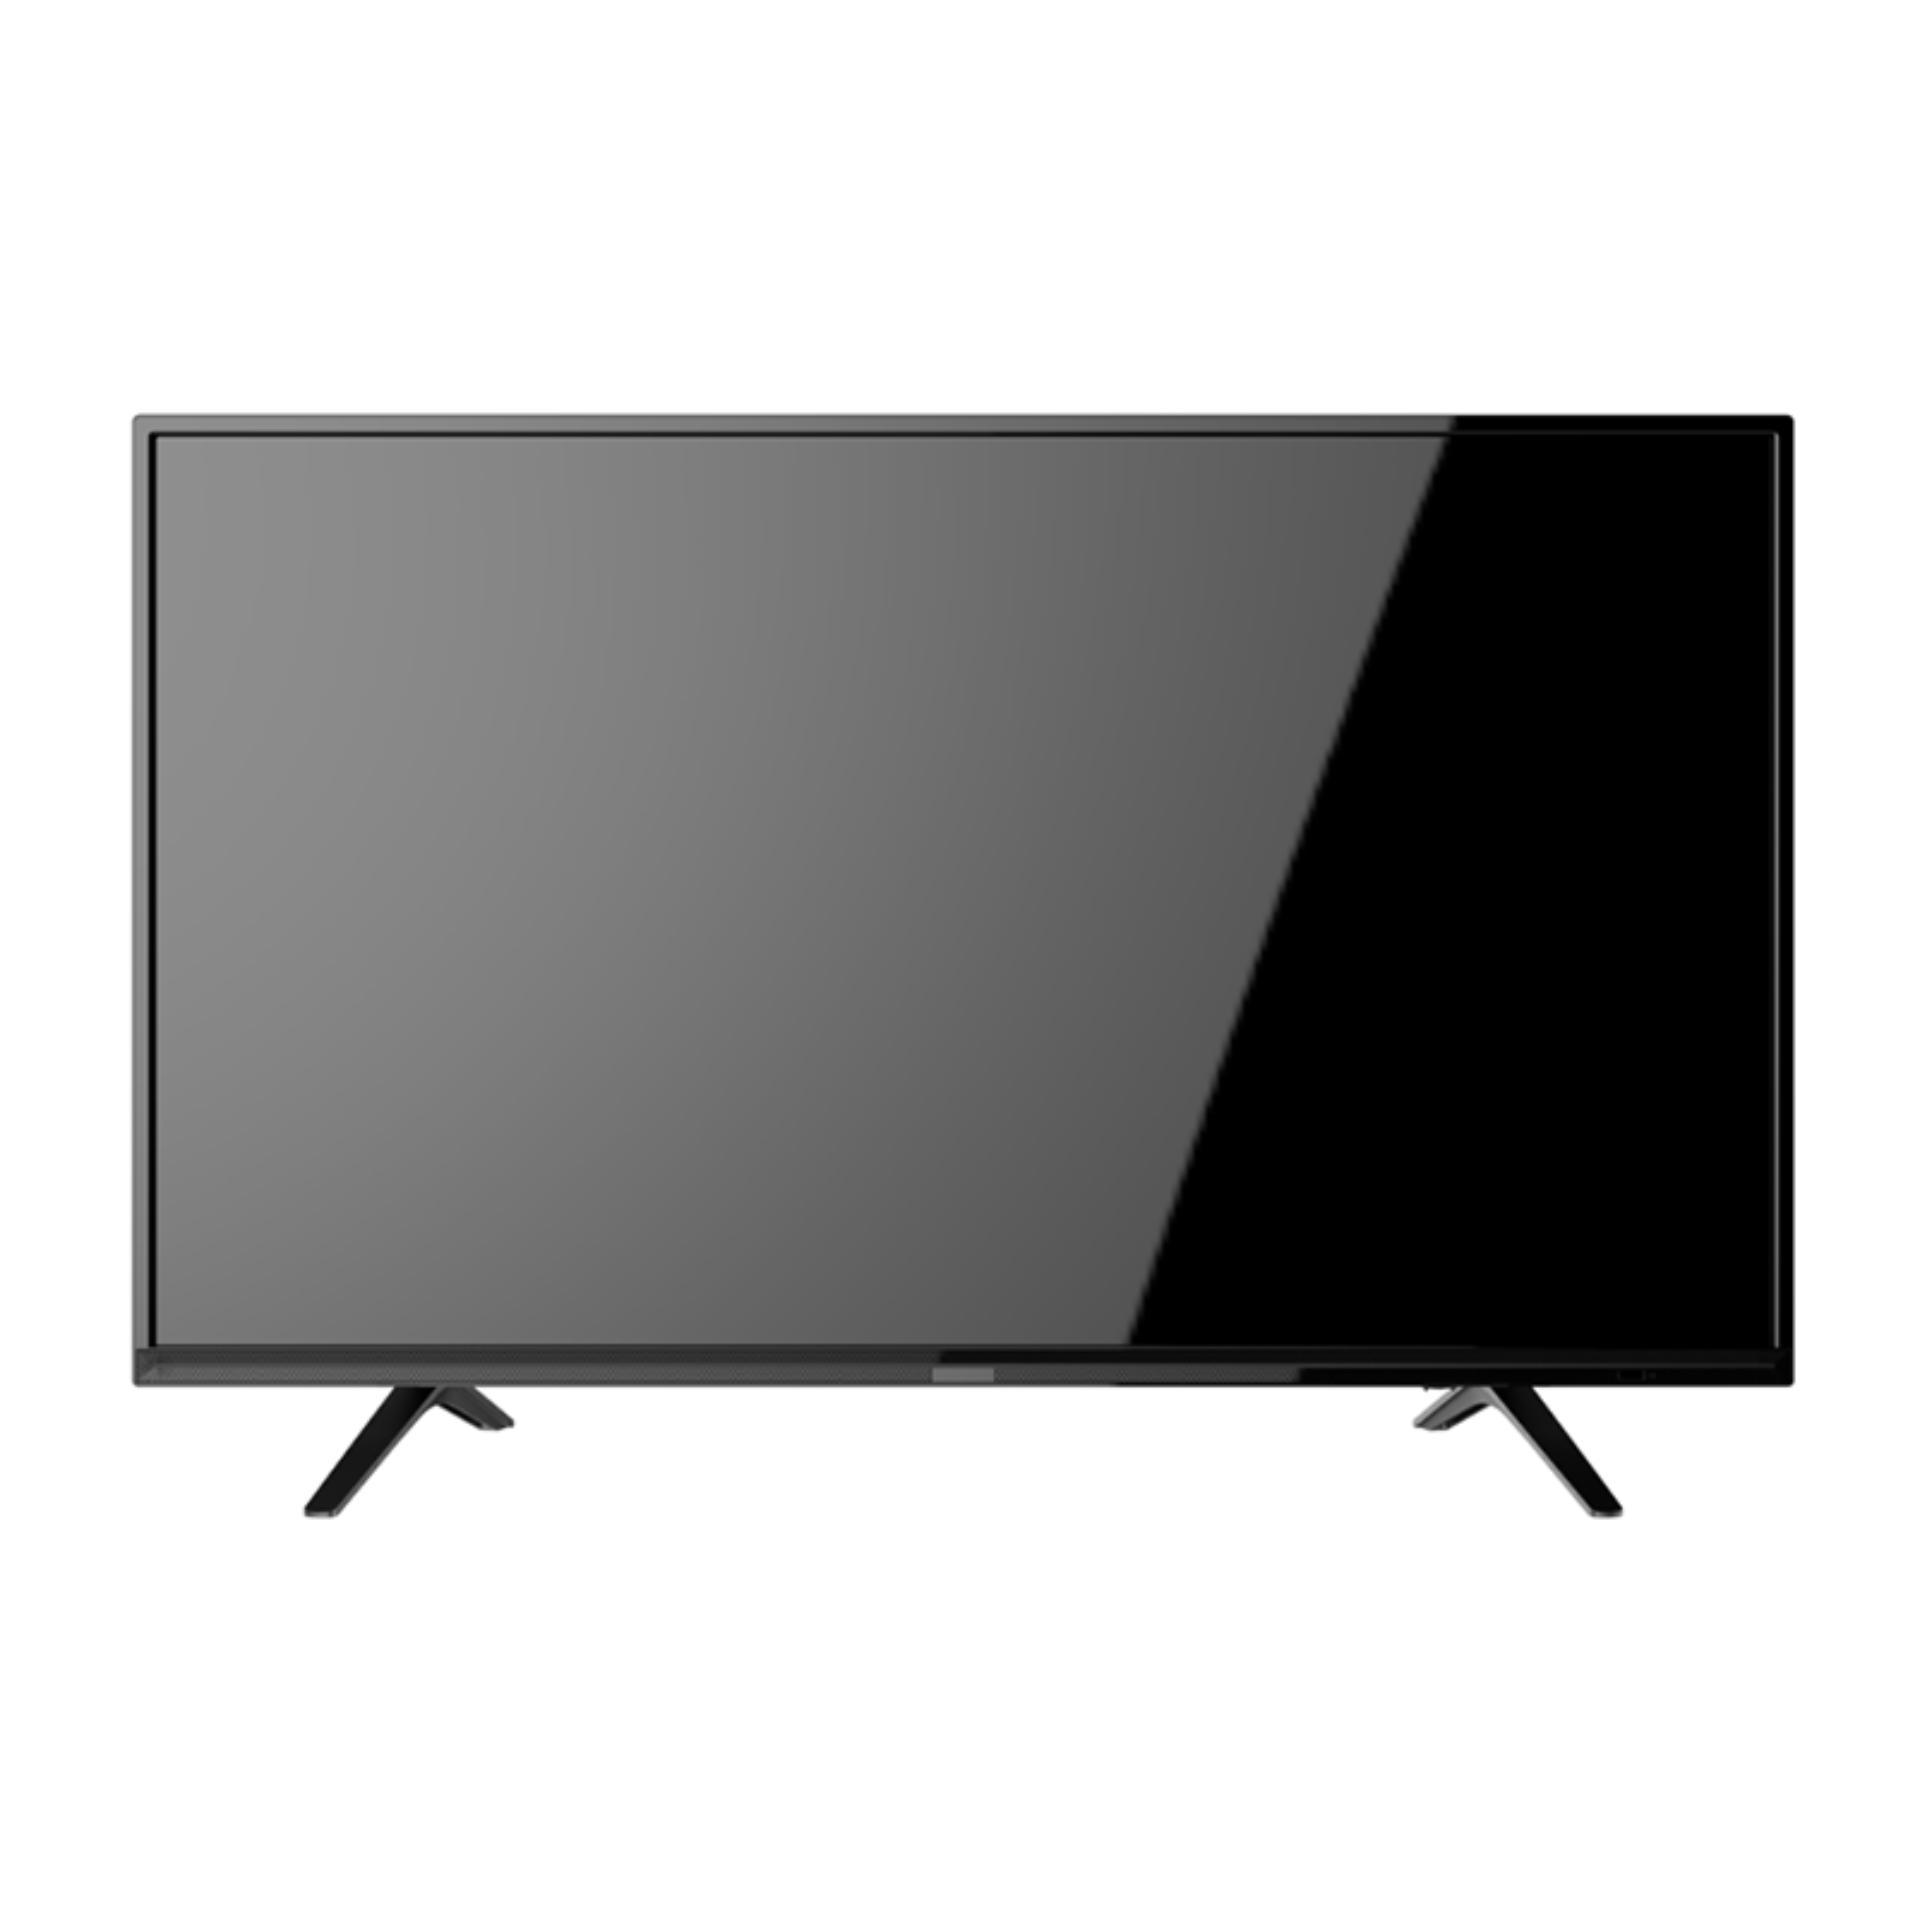 Coocaa 50 Inch Full HD Digital LED TV - Hitam 50E2A12G- Free Bracket